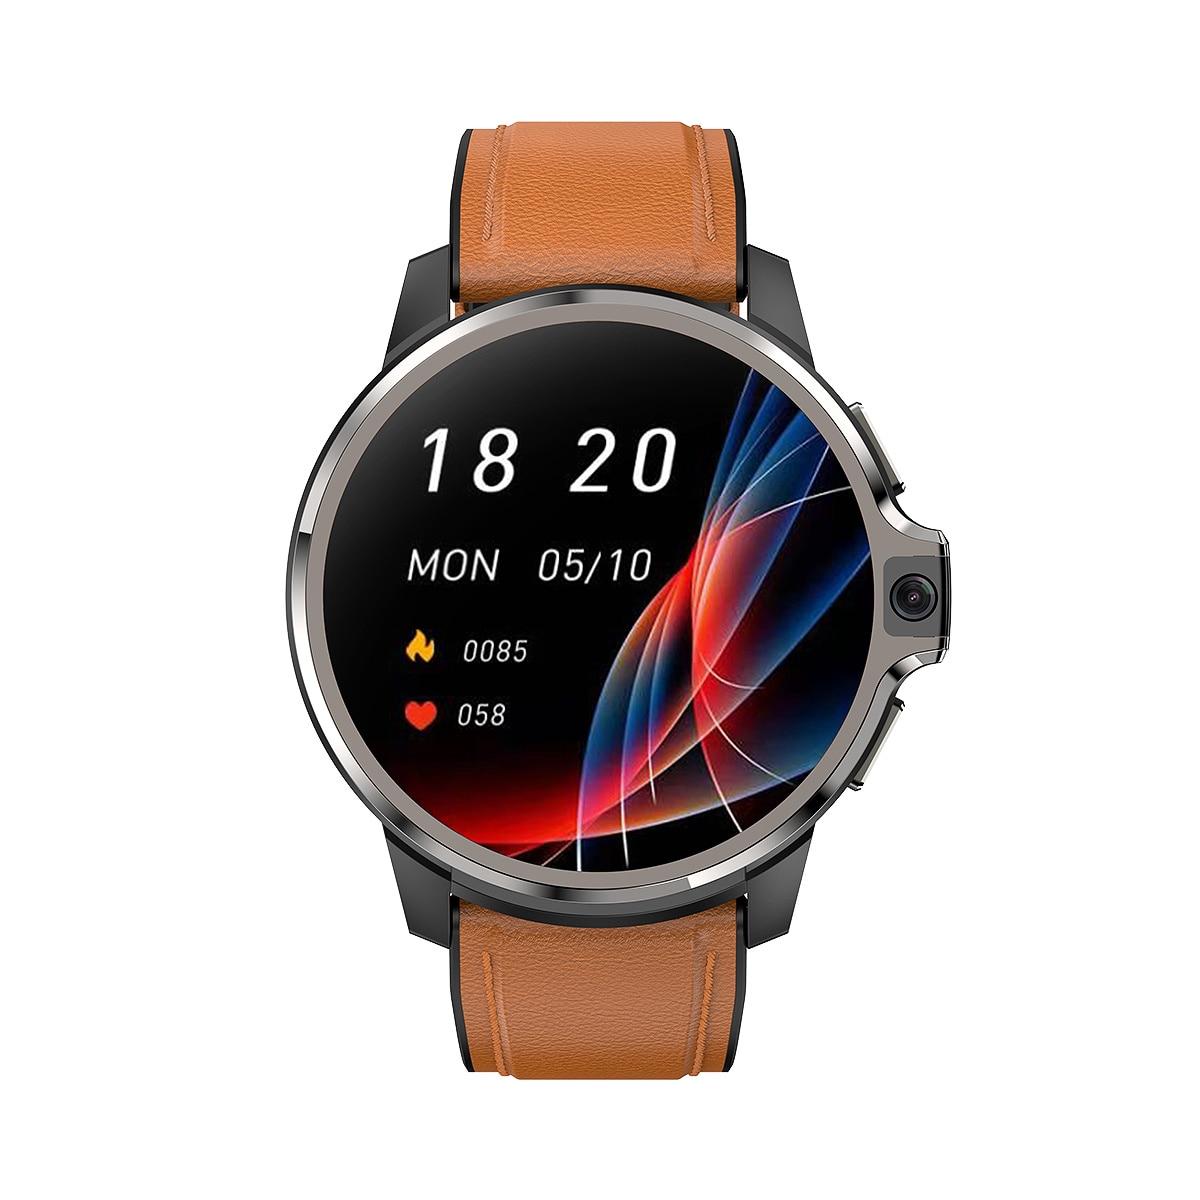 Get DM30 4G Smartwatch RAM 4GB ROM 64/128GB Smart Watch Android 9.1 GPS Wifi Dual System 1050Mah Battery 1.6 Inch HD DM20 DM100